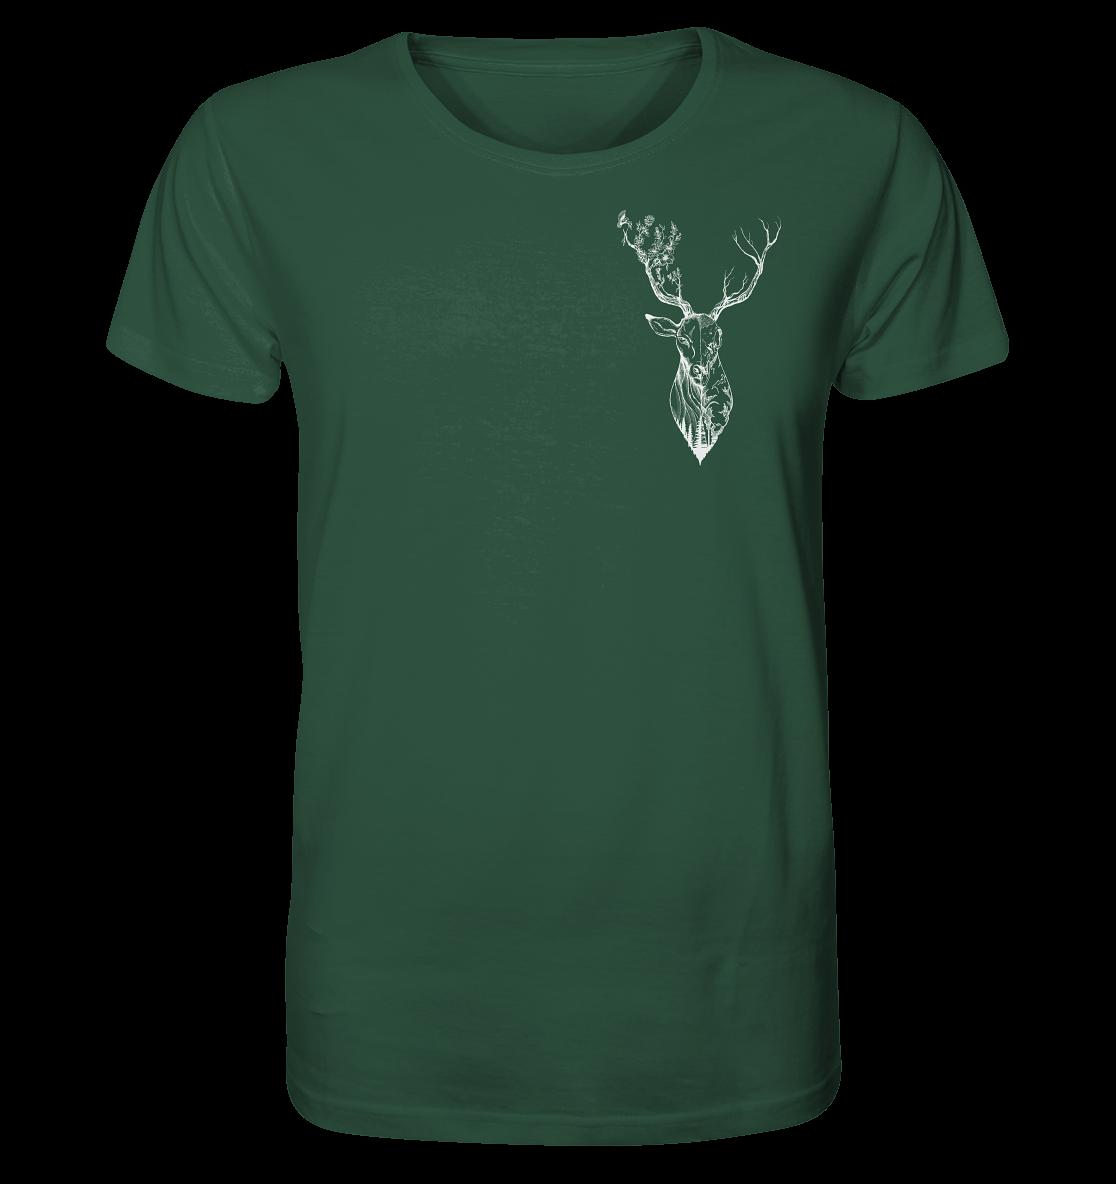 front-organic-shirt-2f5240-1116x-5.png